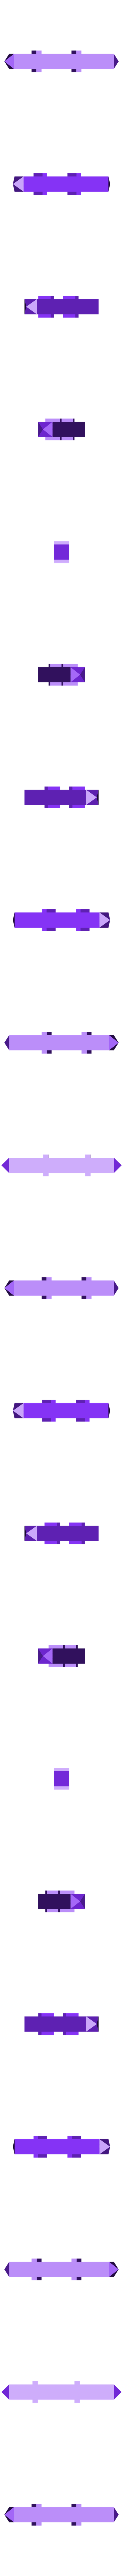 Shaft.stl Download free STL file Bubbles! • 3D printer object, Zippityboomba